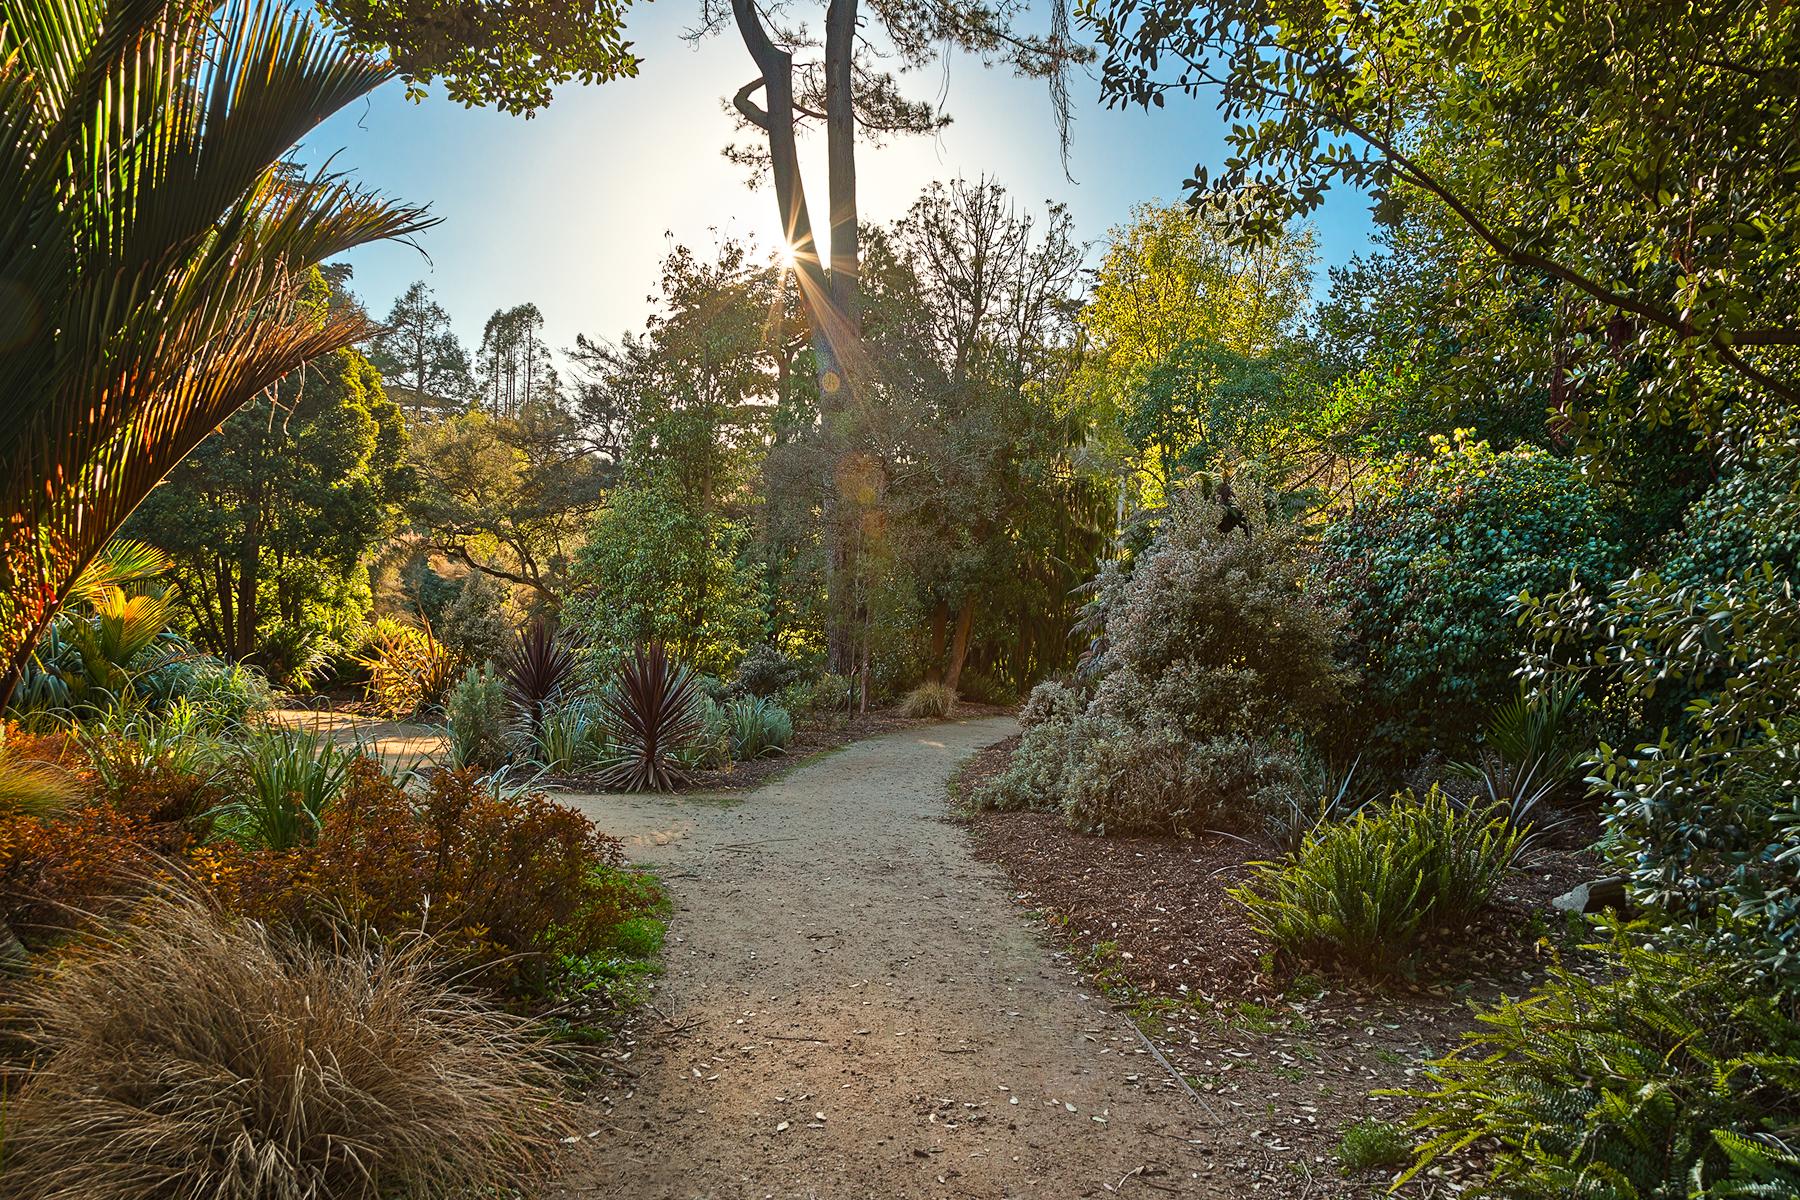 Botanical gardens trail - hdr photo